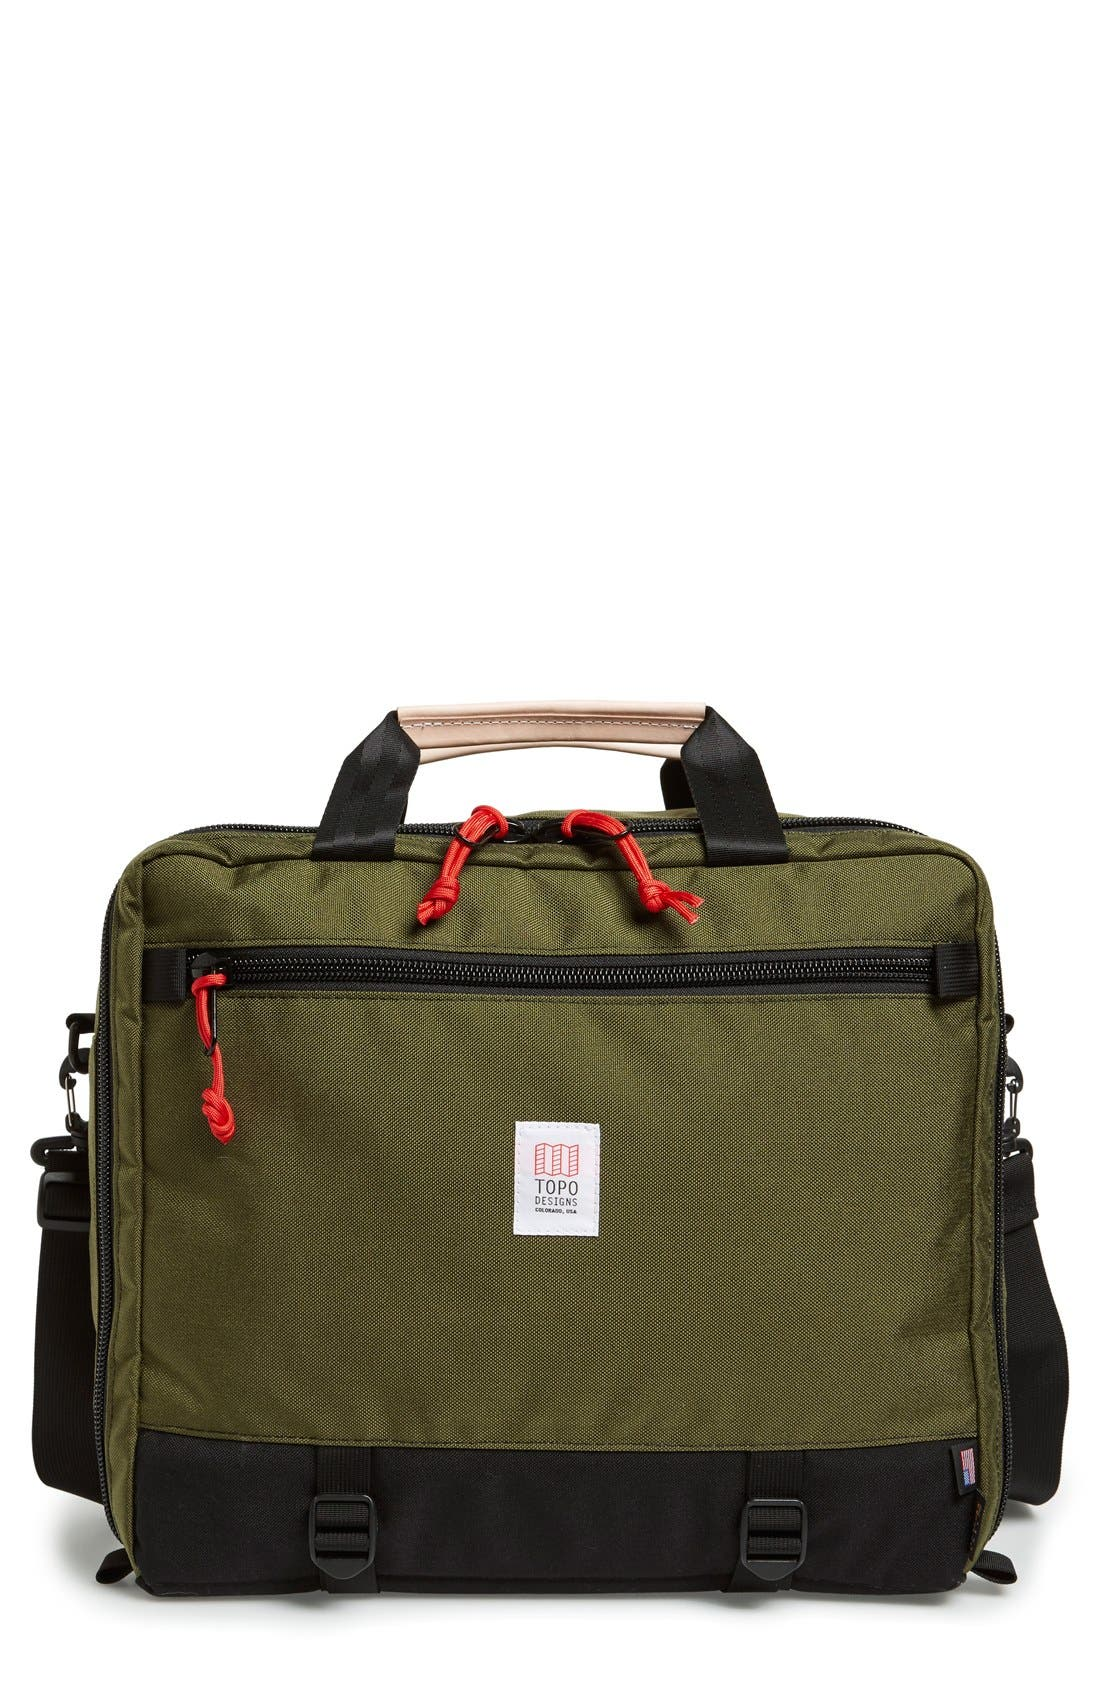 Topo Designs '3-Day' Briefcase